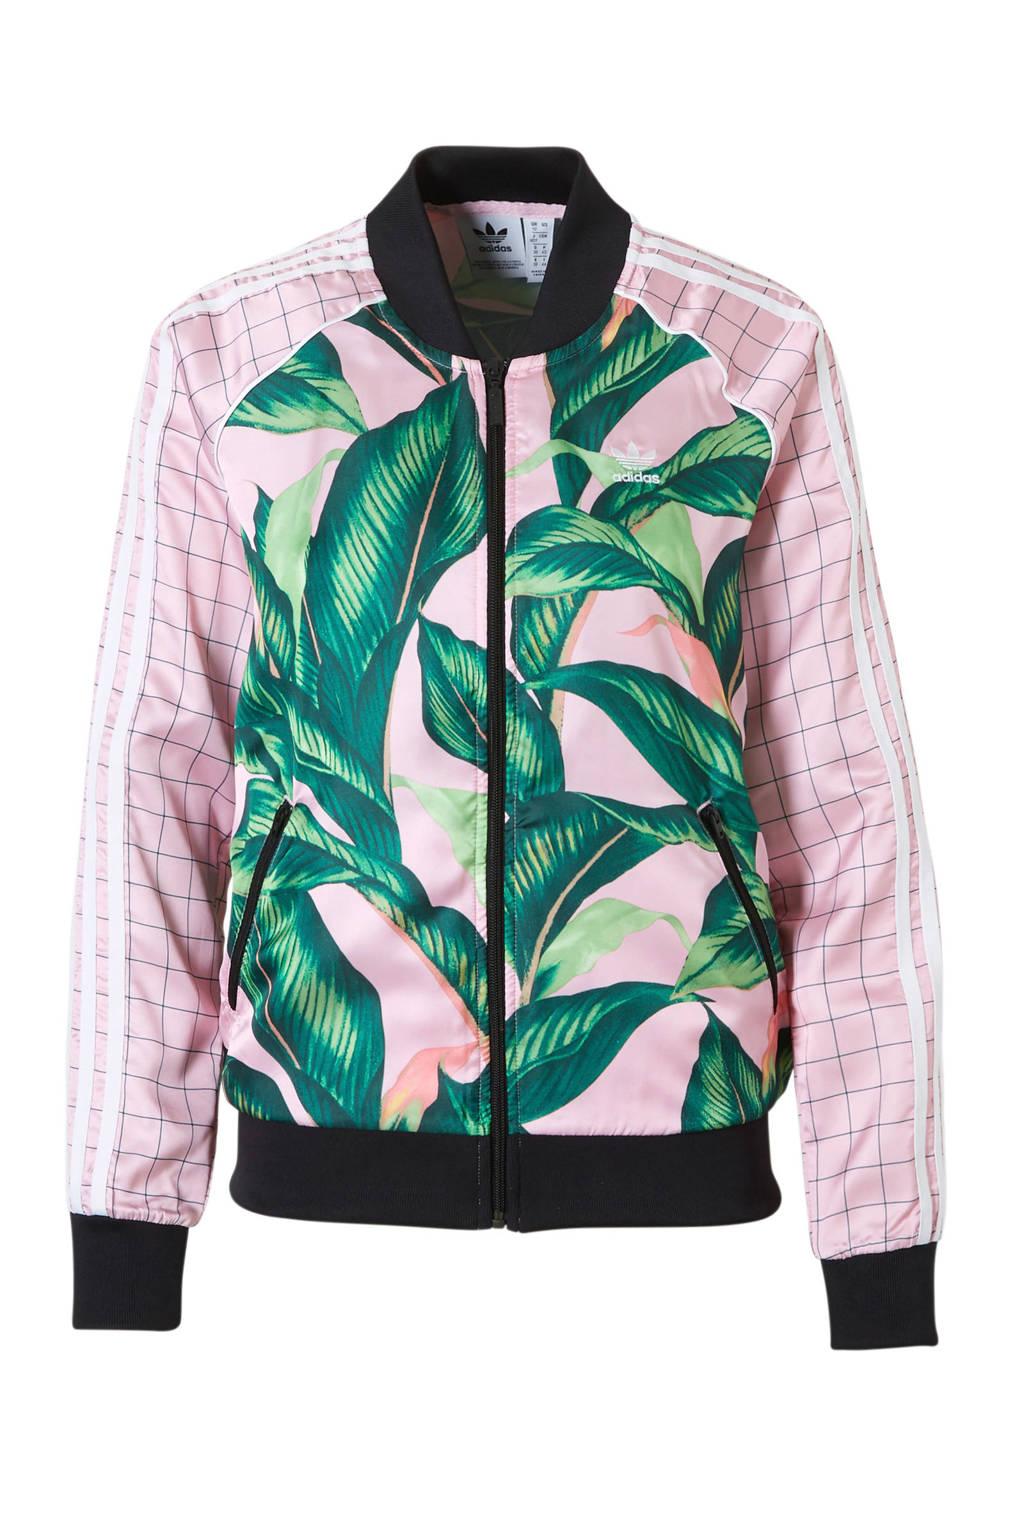 20482ce56f2 adidas originals vest, Roze/groen/zwart